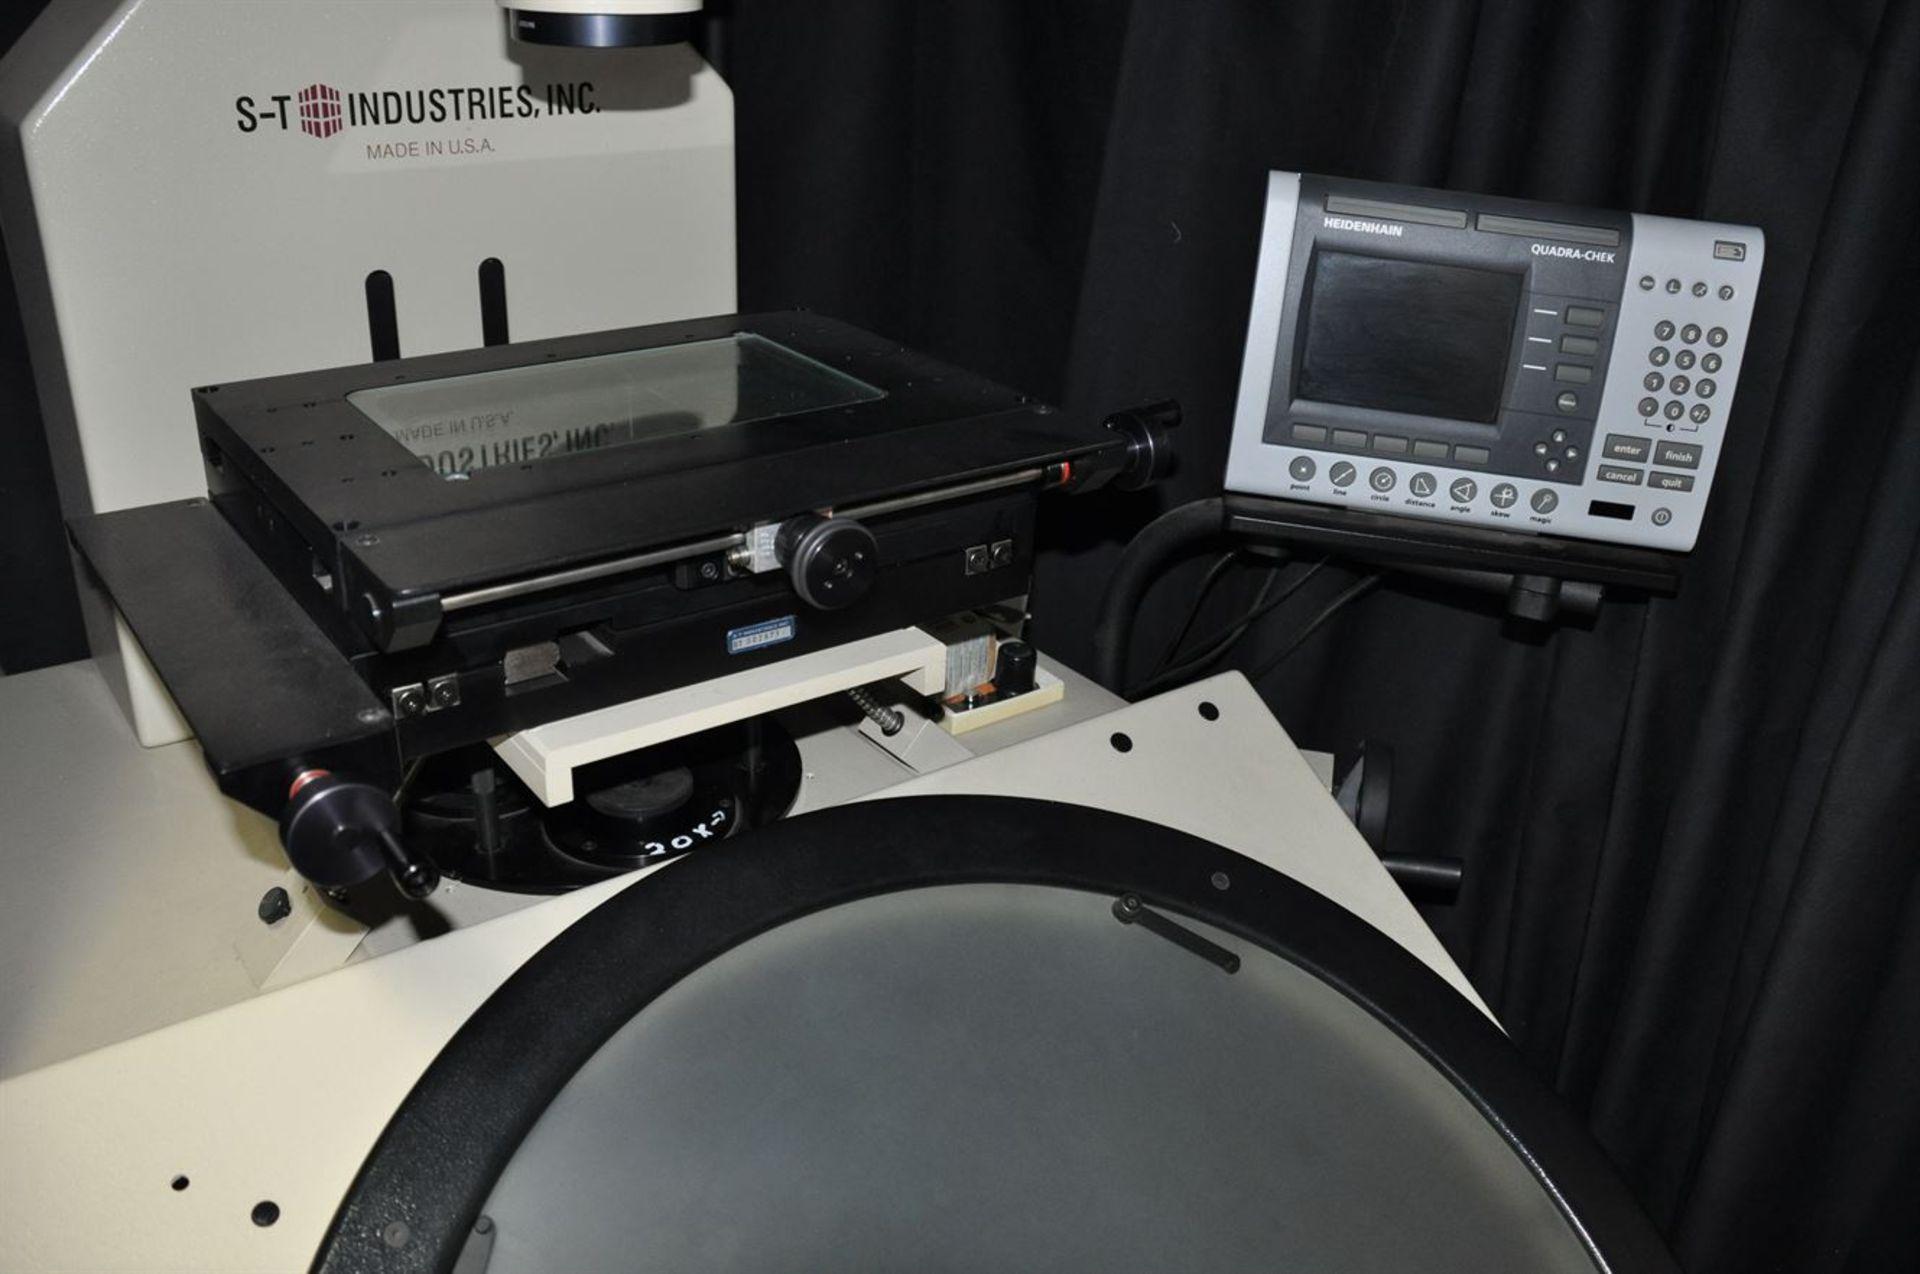 "2012 SCHERR TUMICO 20-2400 24"" Optical Comparator w/ 20x, 50x, 100x magnification, s/n K123201, w/ - Image 2 of 2"